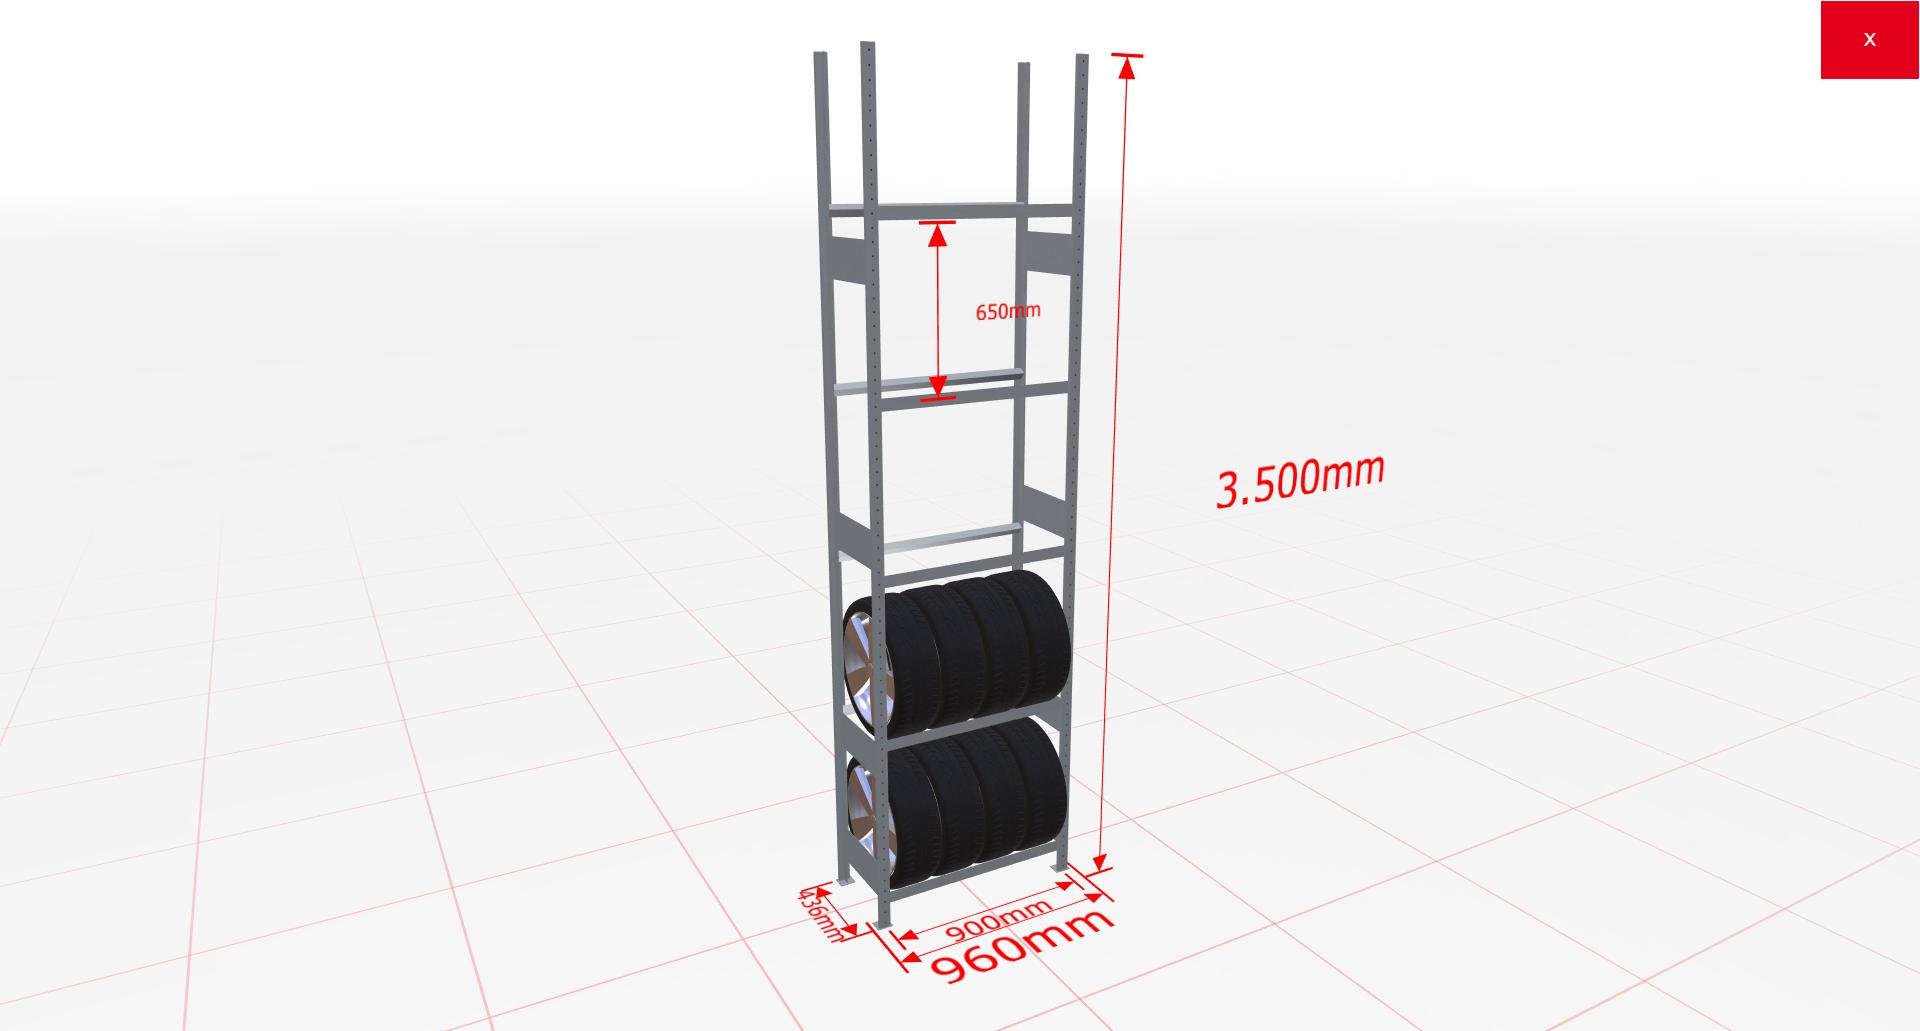 Räderregal Grundregal SCHULTE Lagertechnik 3500x900x400 mm – 5 Ebenen á 900 mm, verzinkt